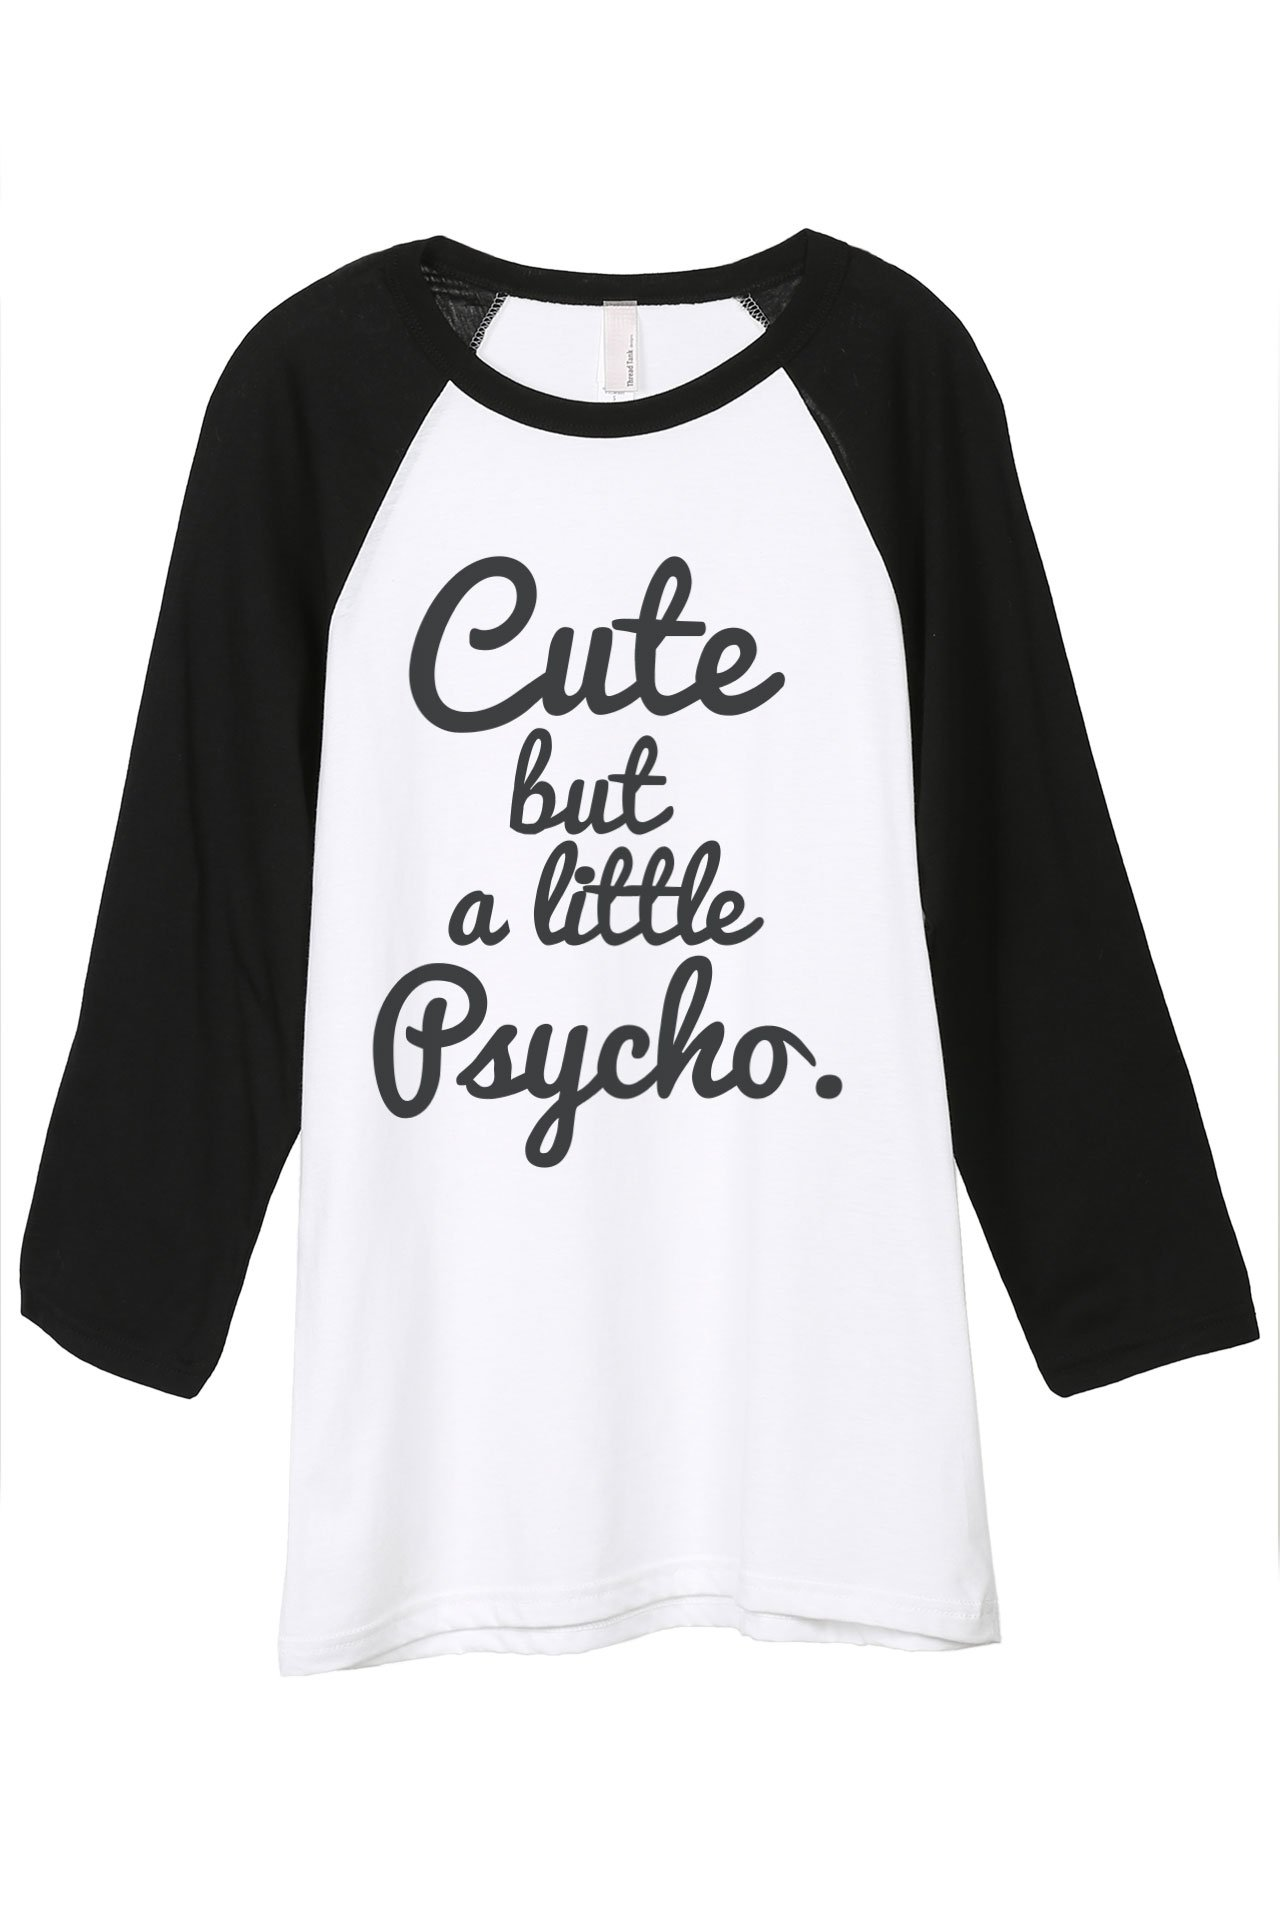 Thread Tank Cute But A Little Psycho Unisex 3 4 Sleeves Baseball Raglan T Shirt Tee 1148